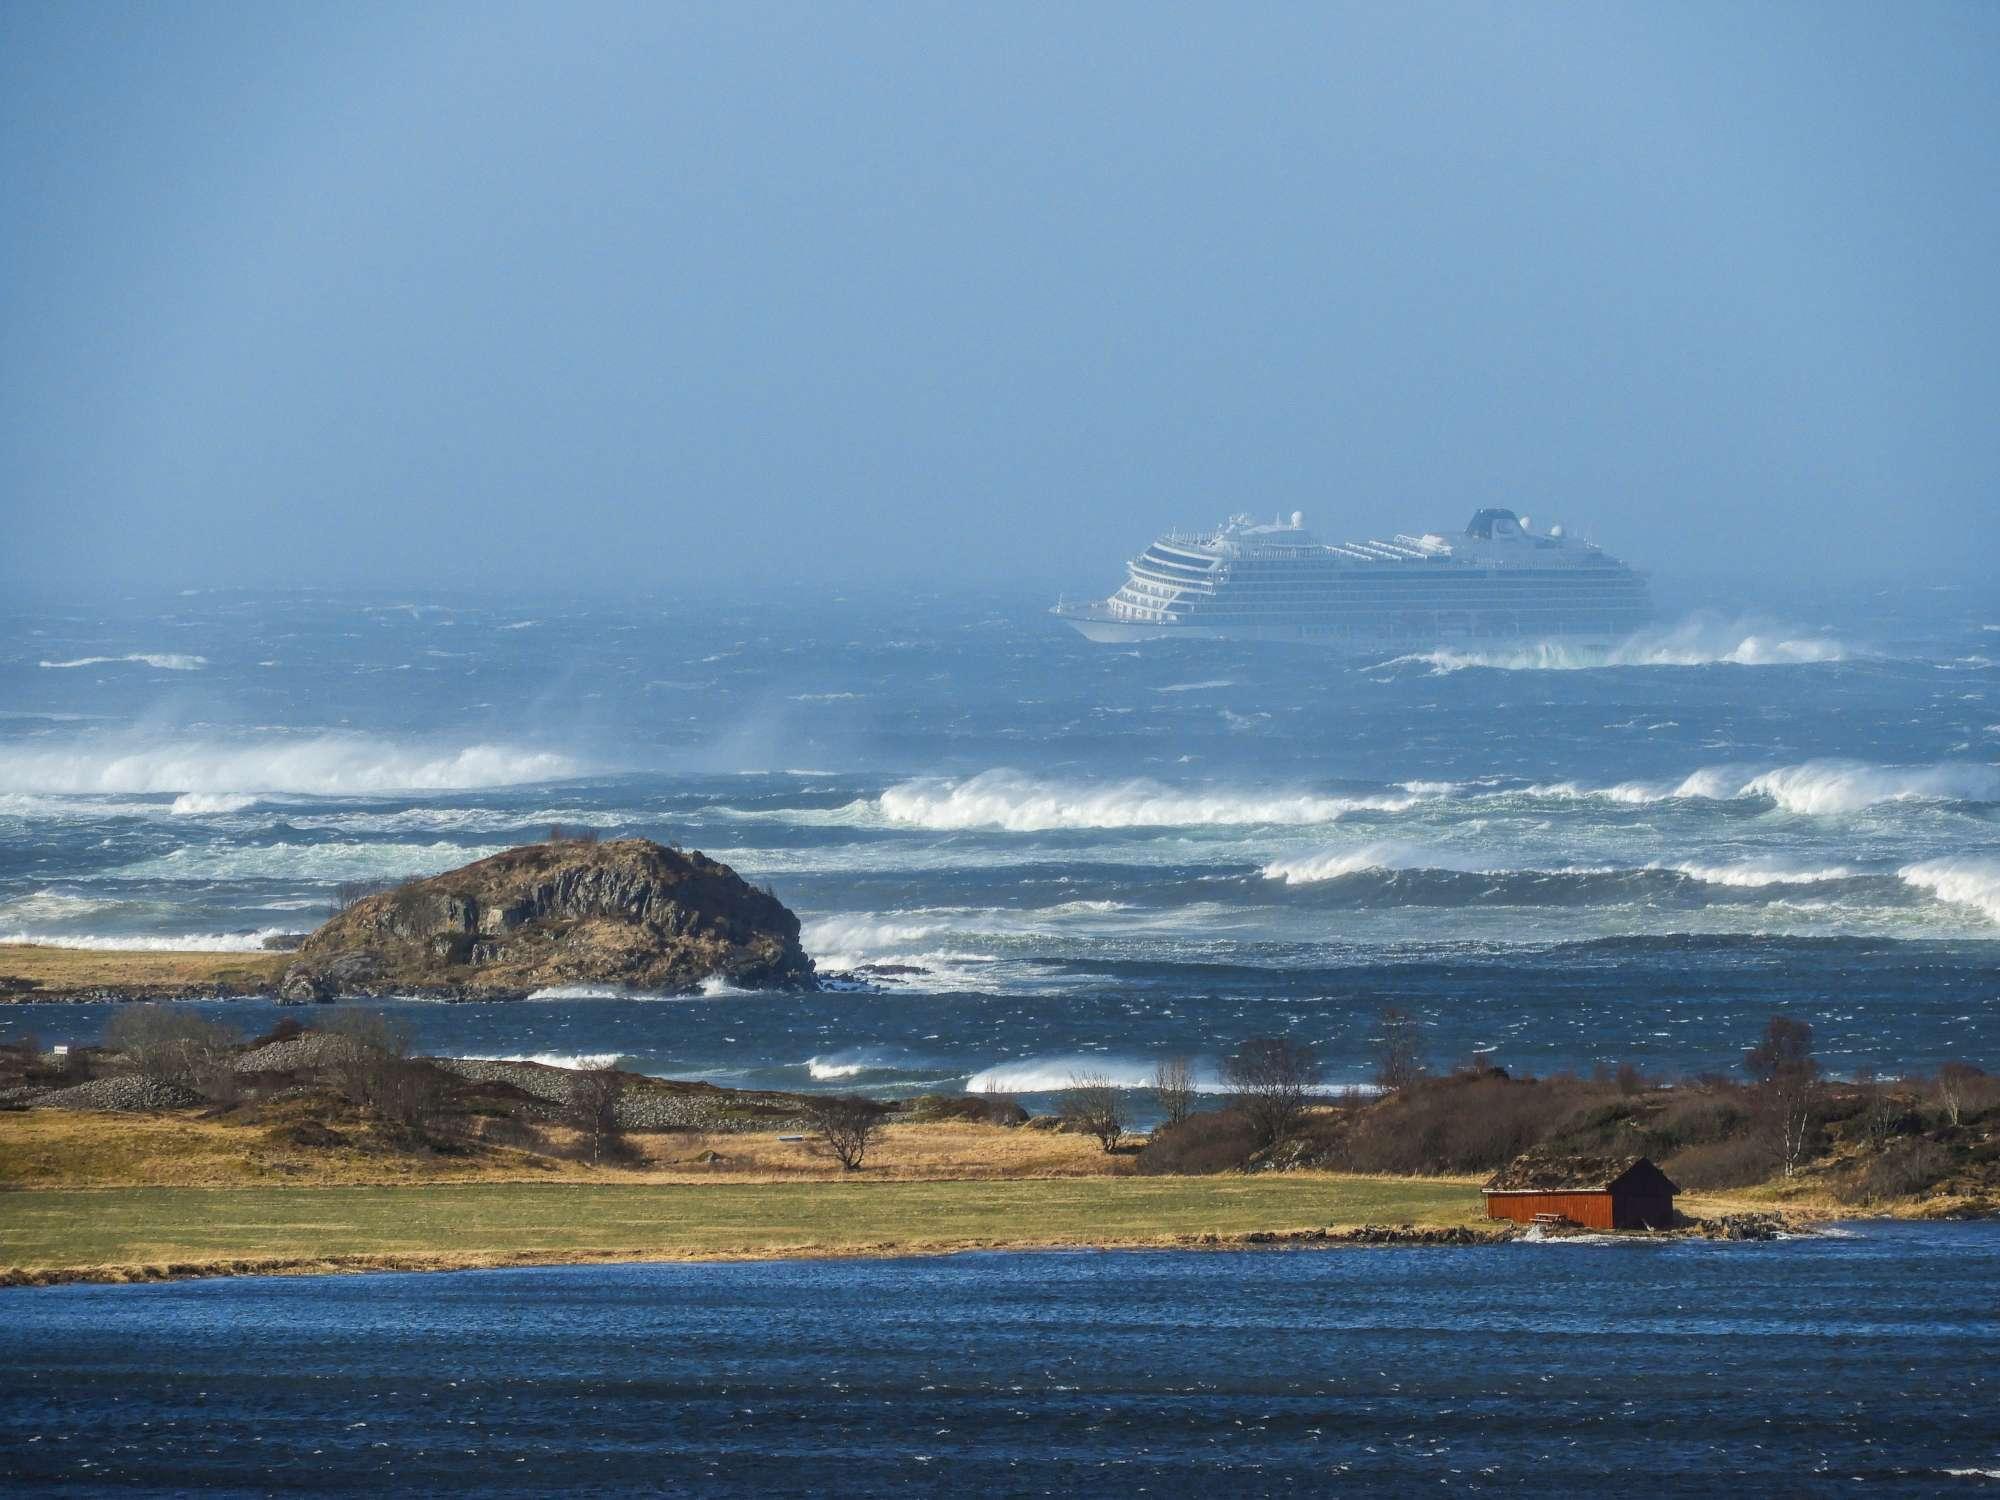 Norvegia, la nave da crociera Viking Sky in avaria